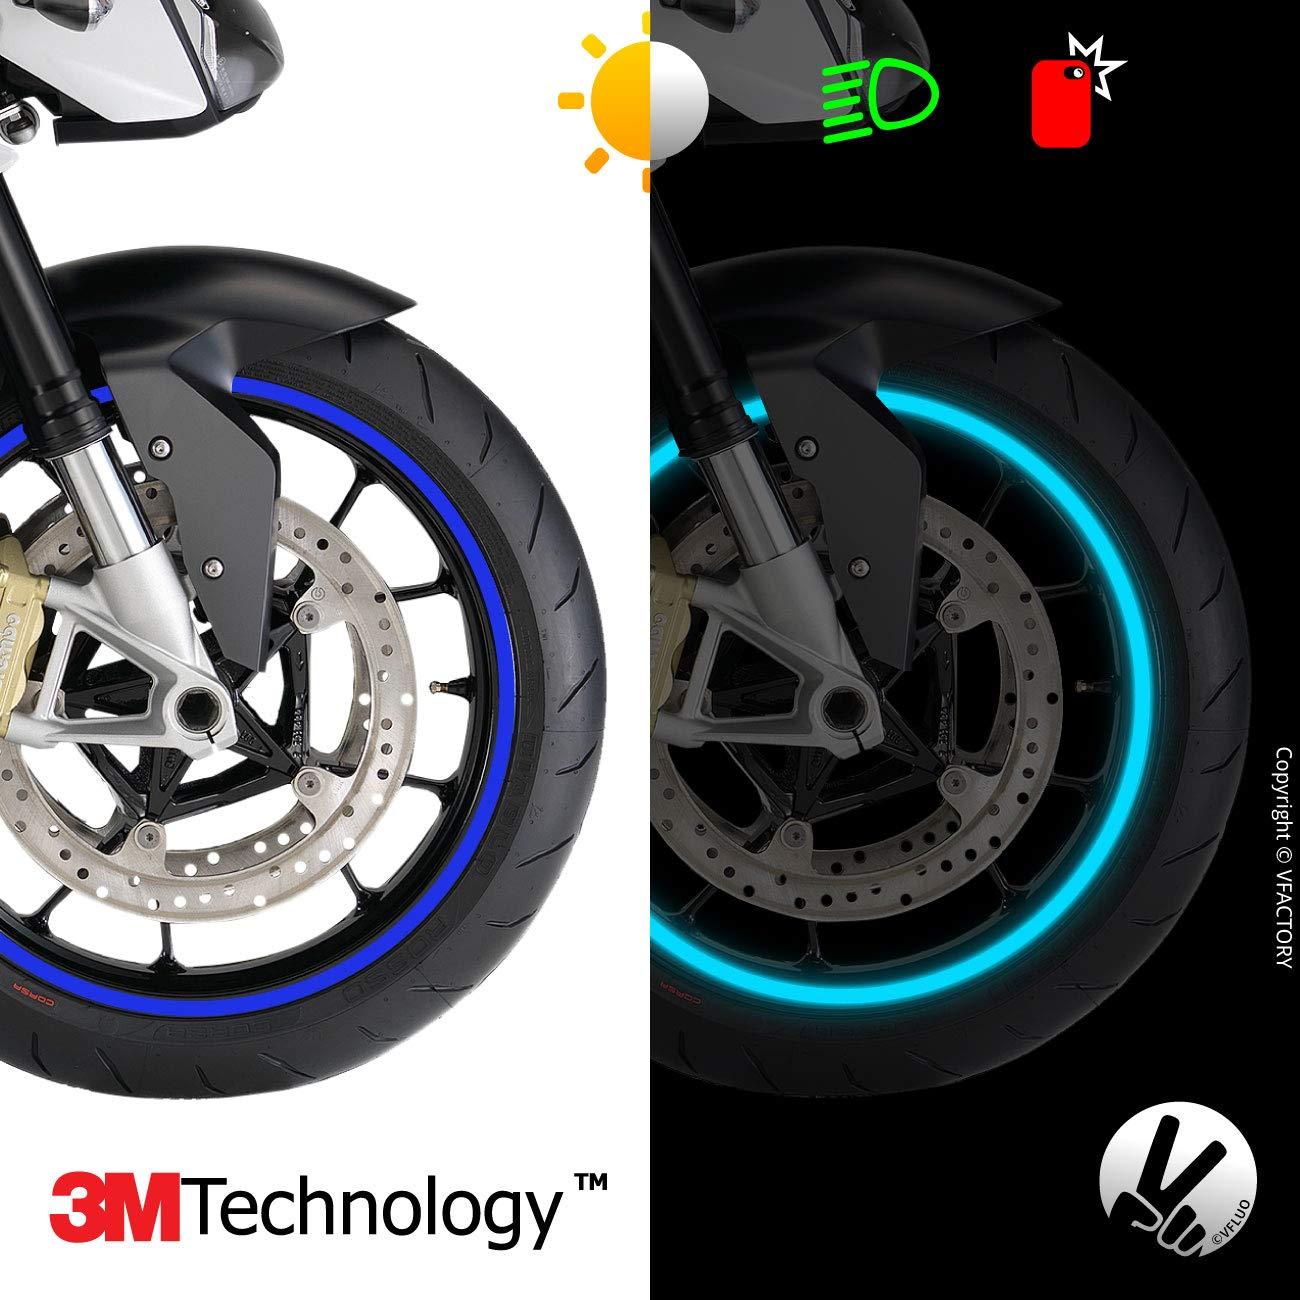 VFLUO CIRCULAR/™ 1 wheel motorcycle retro reflective wheel stripes kit 3M Technology/™ Orange 7 mm width